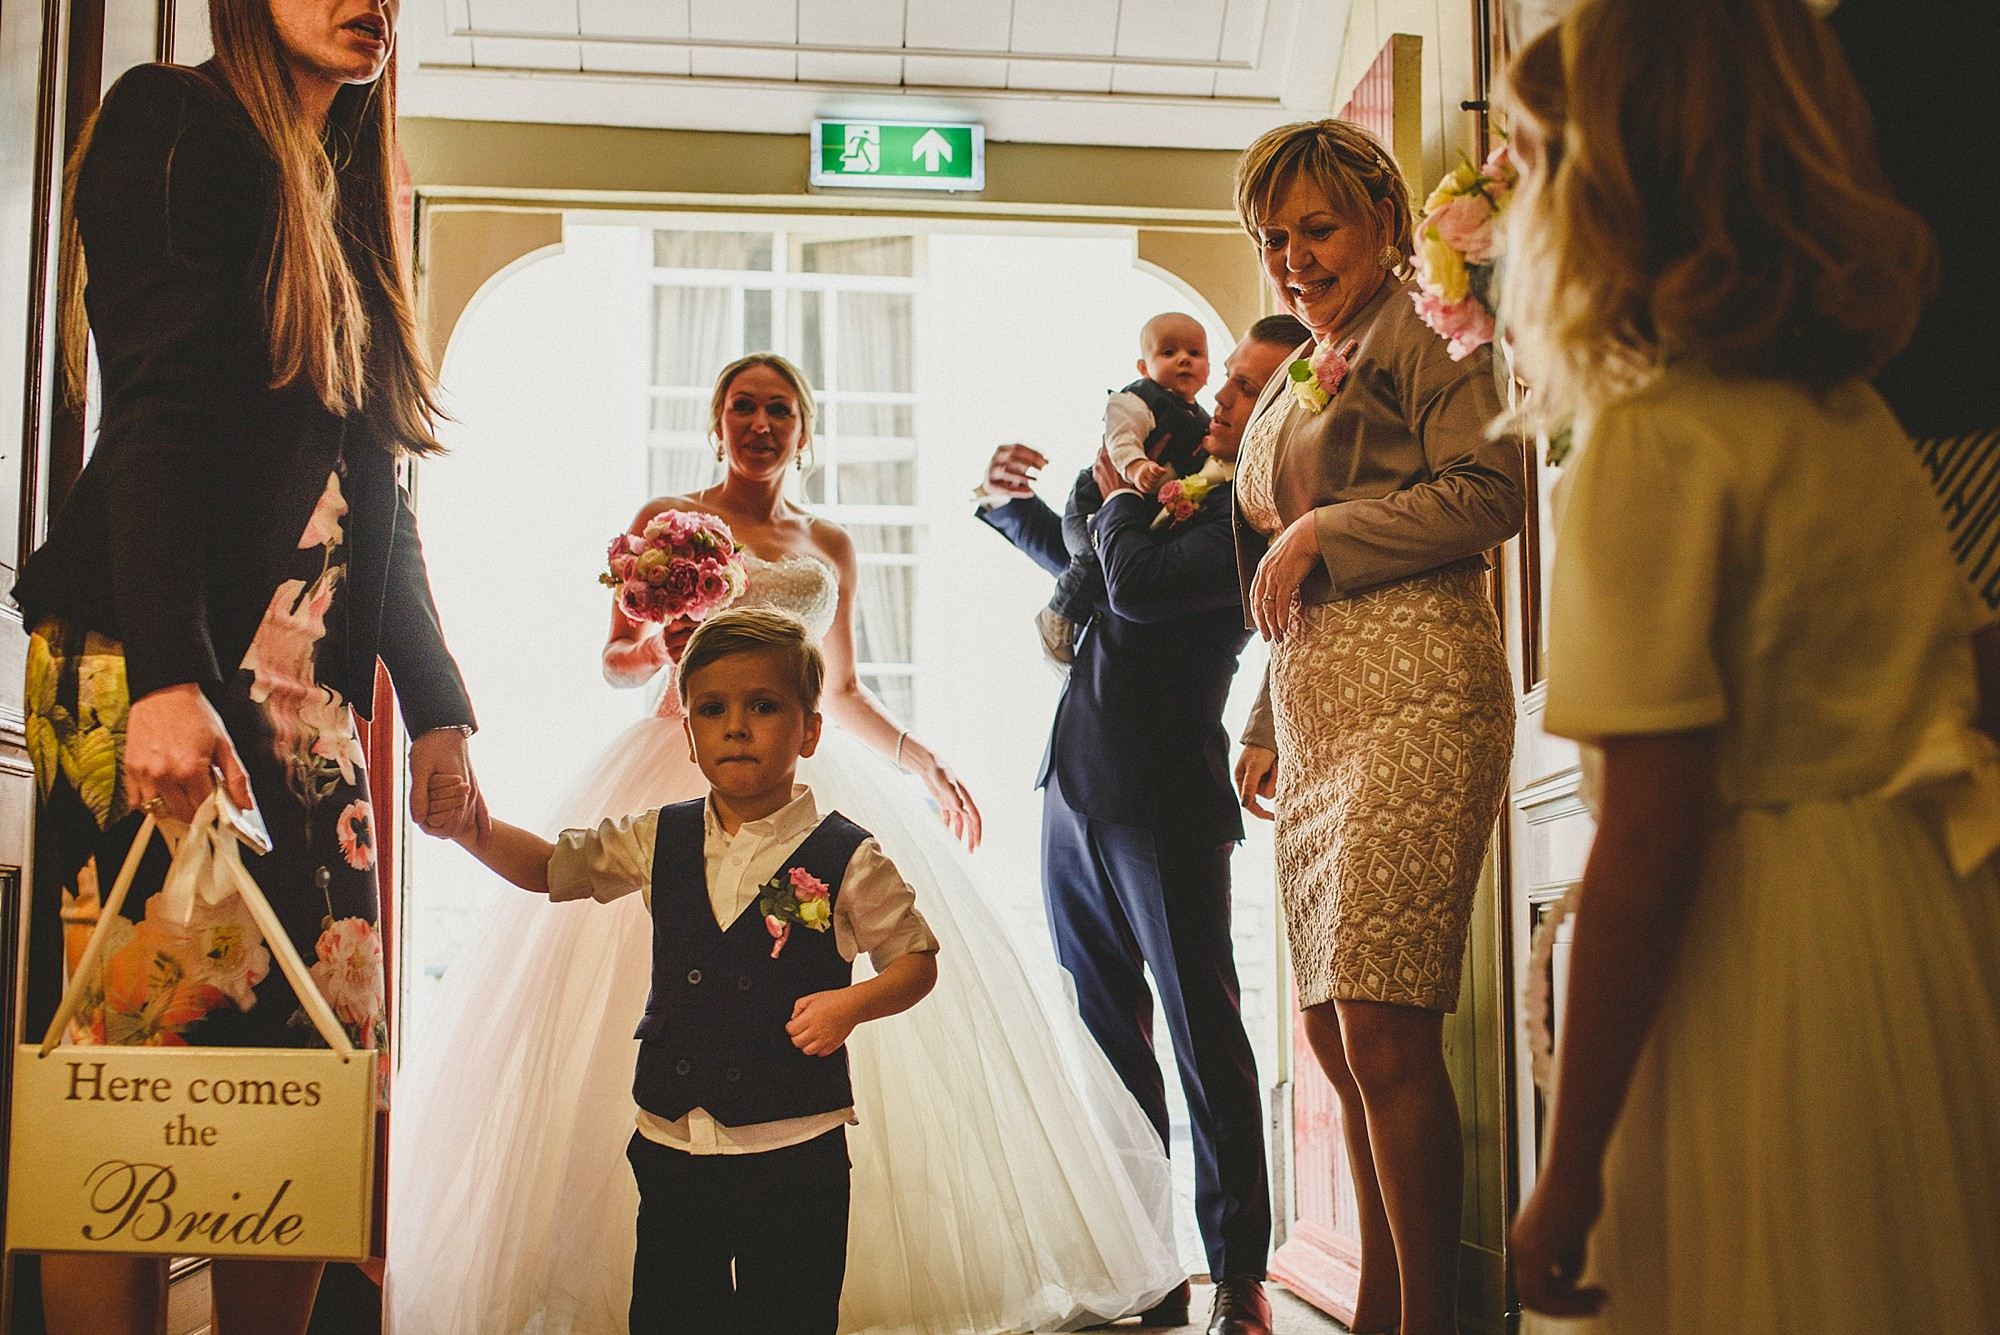 beste trouwfotograaf van nederlandb (1 van 2).jpg